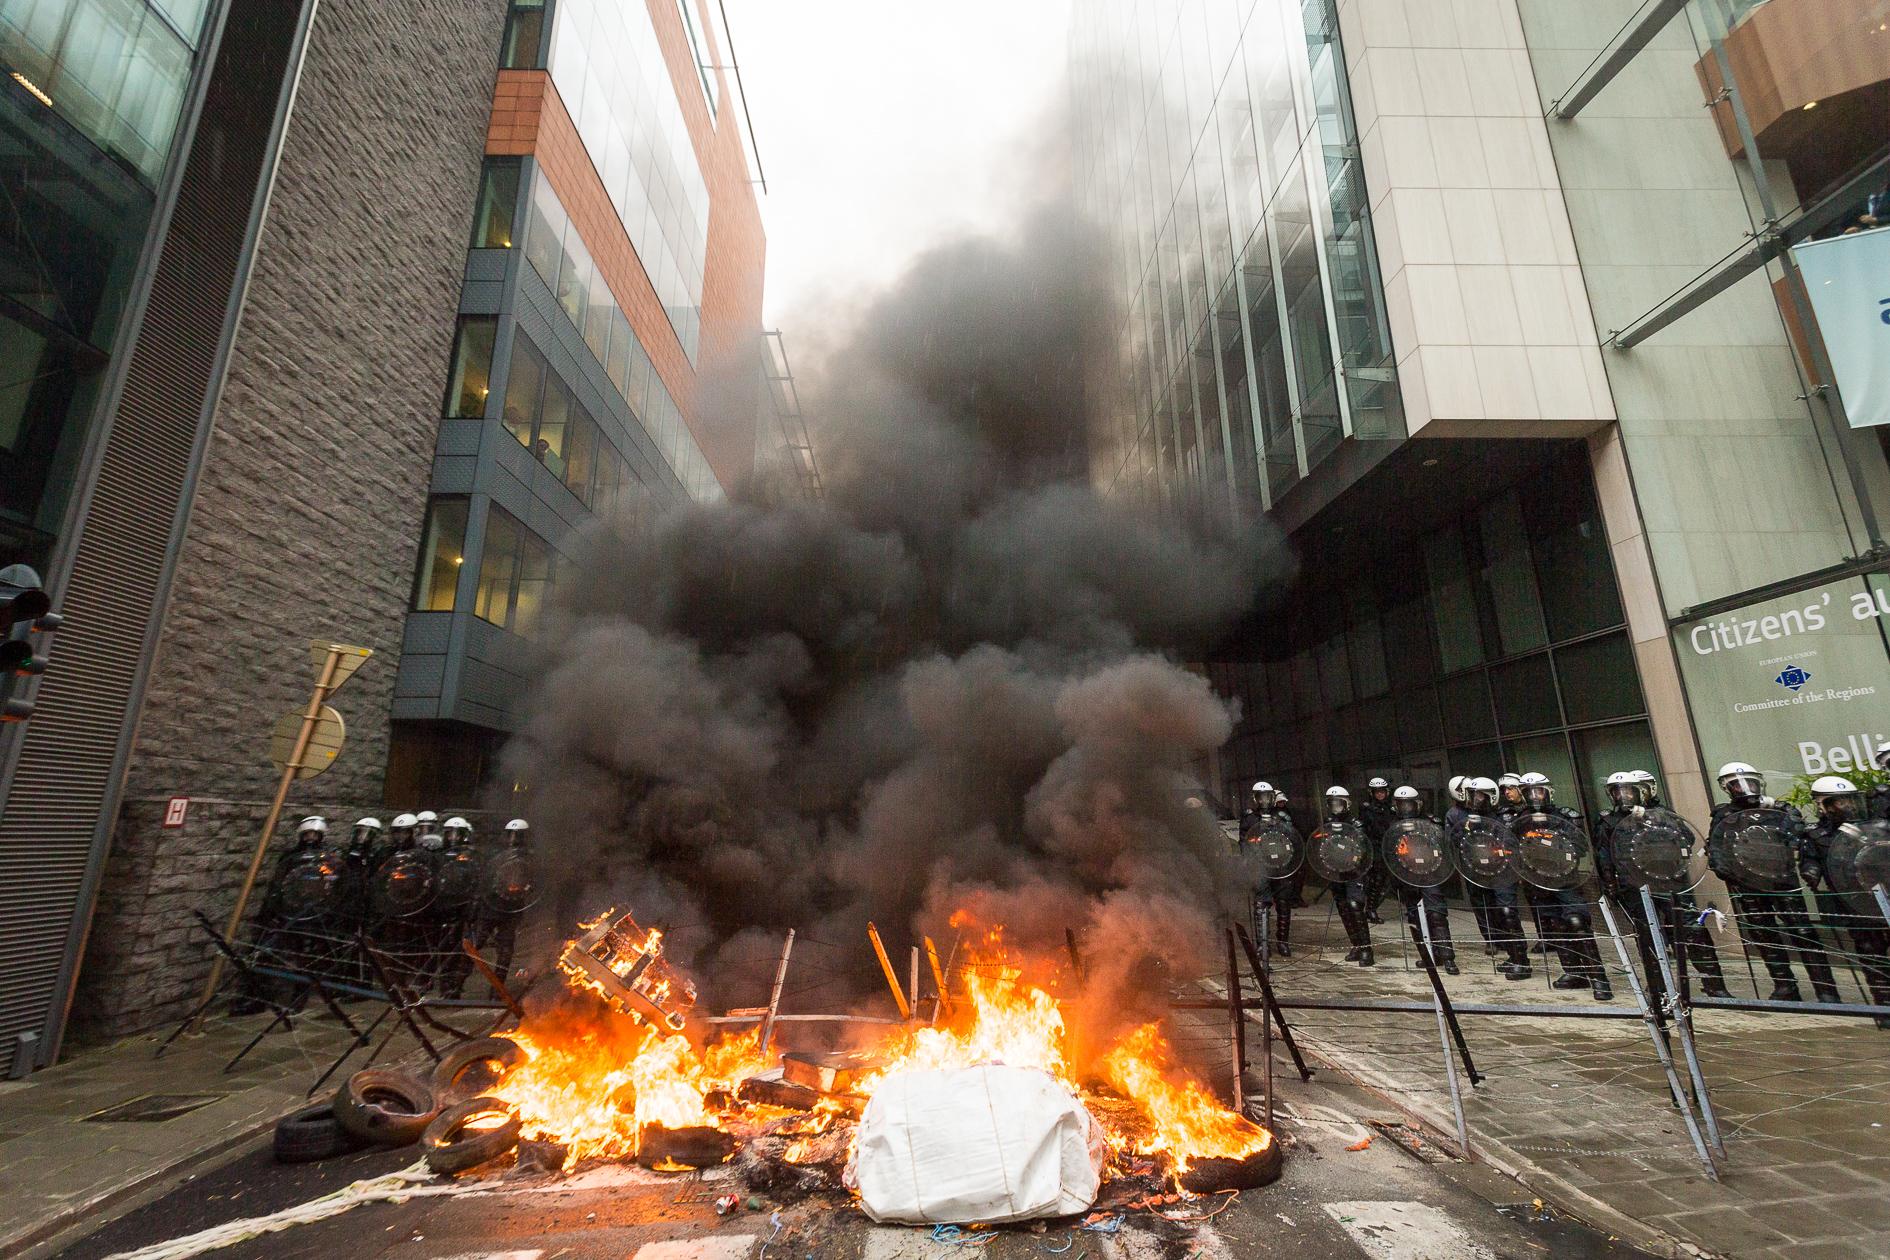 Boerenbetoging Brussel